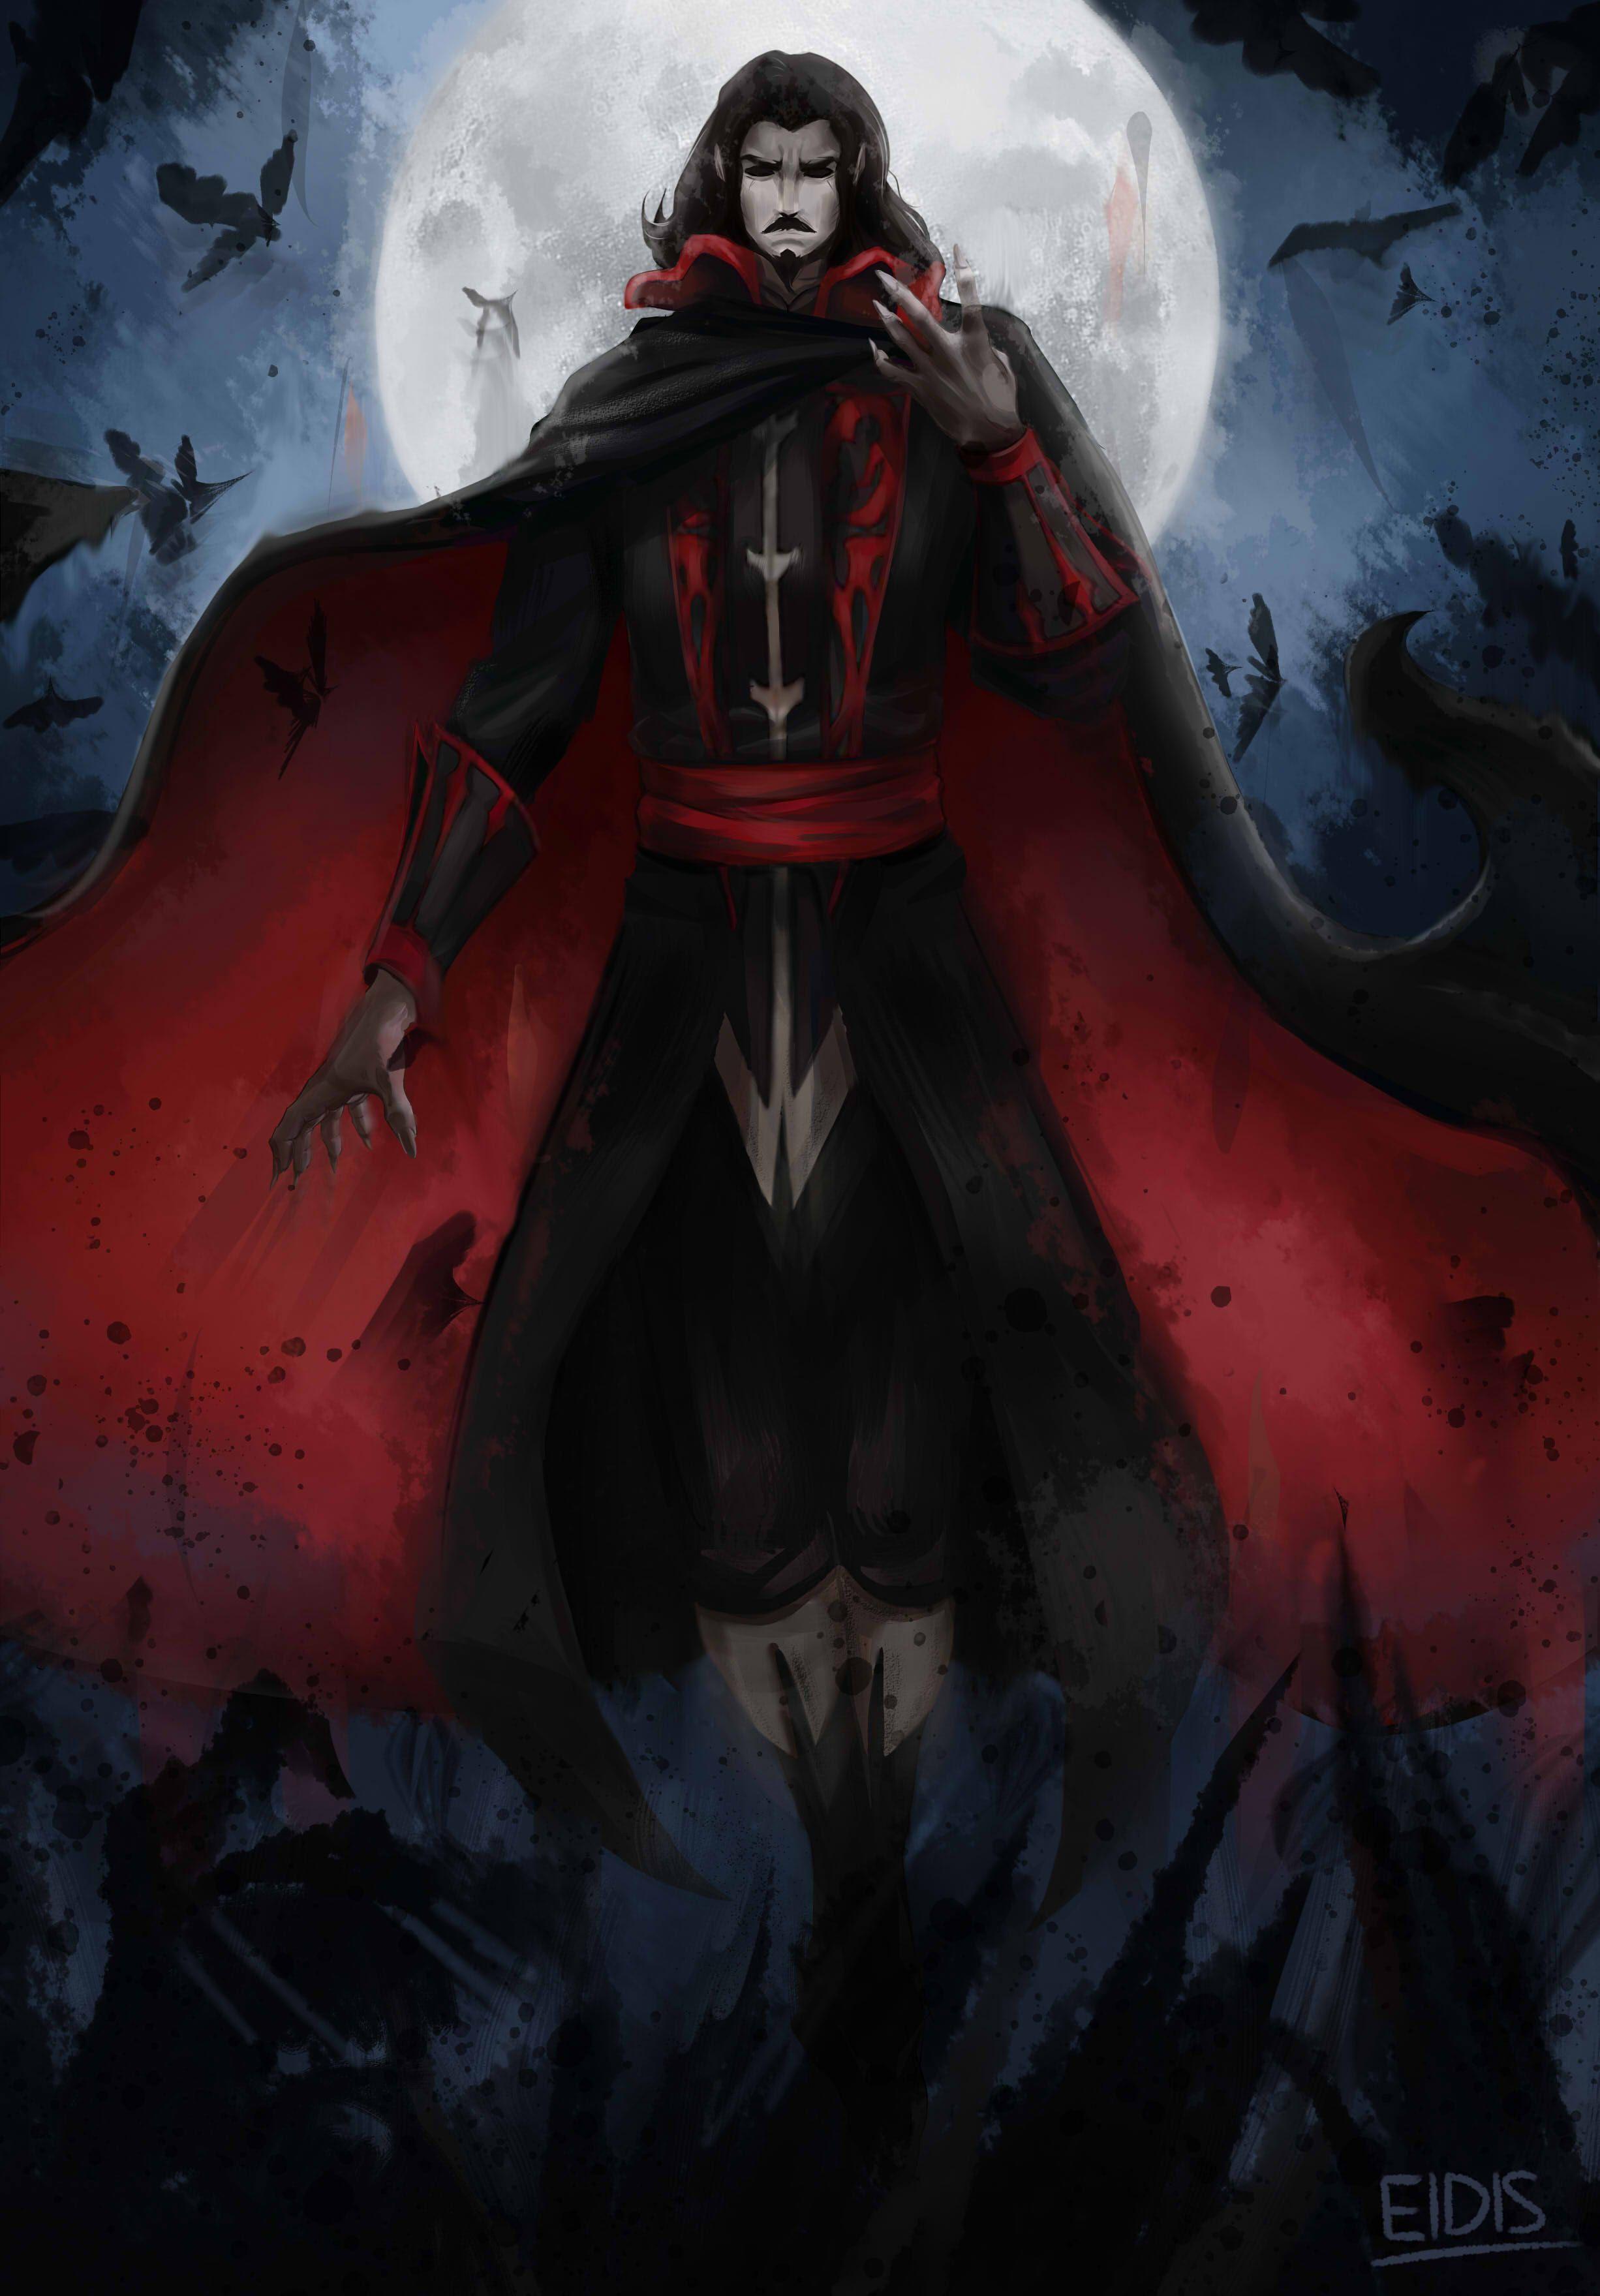 Castlevania Dracula Vampire Art Castlevania Lord Of Shadow Dracula Art